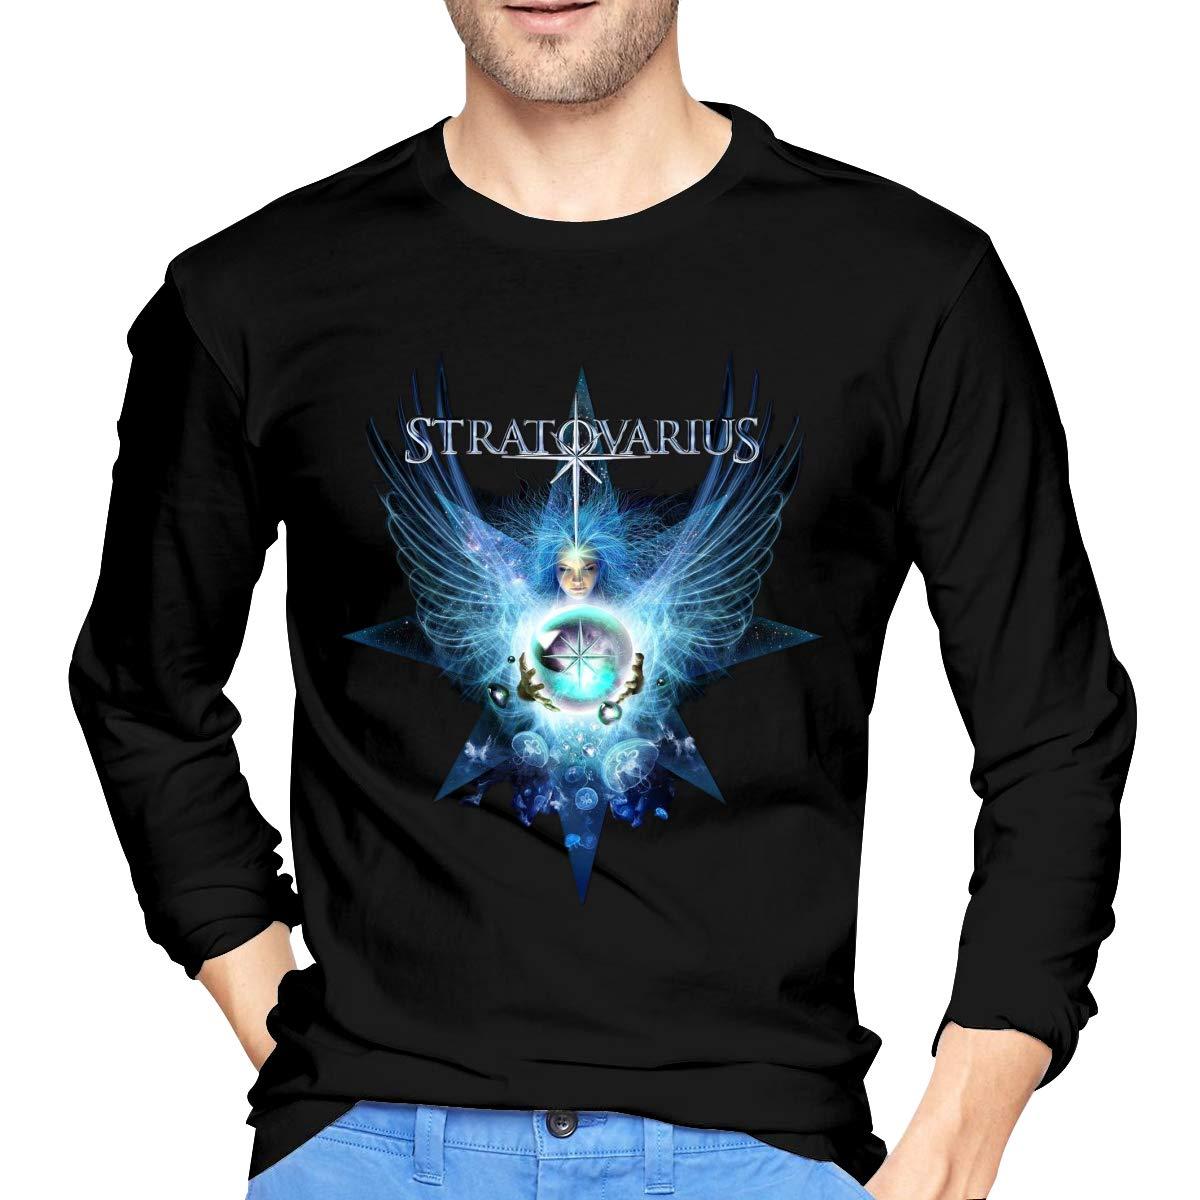 Lihehen S Stratovarius Round Neck T Shirt S